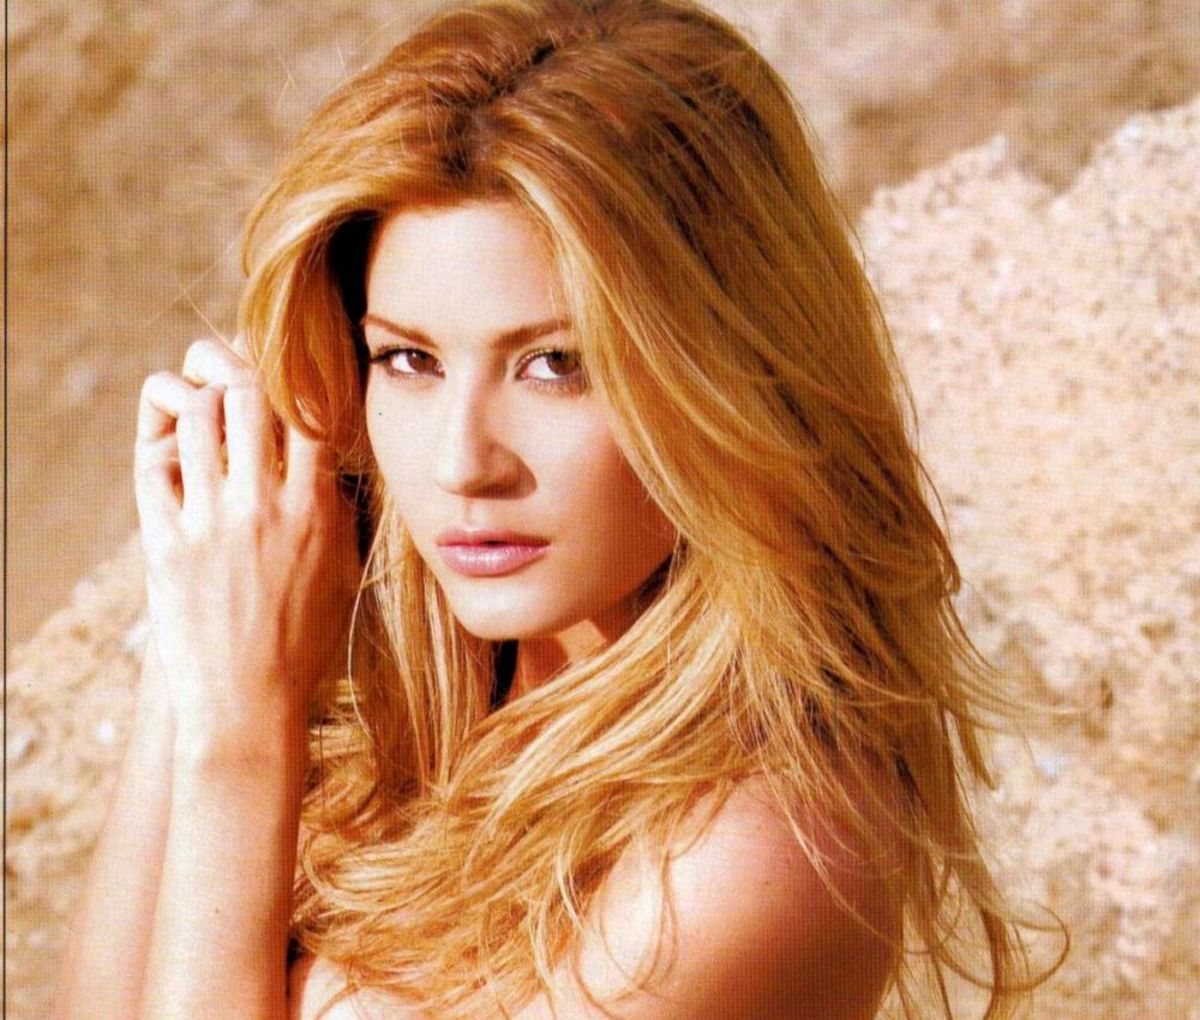 Venezuelan actress and model Mirela Mendoza